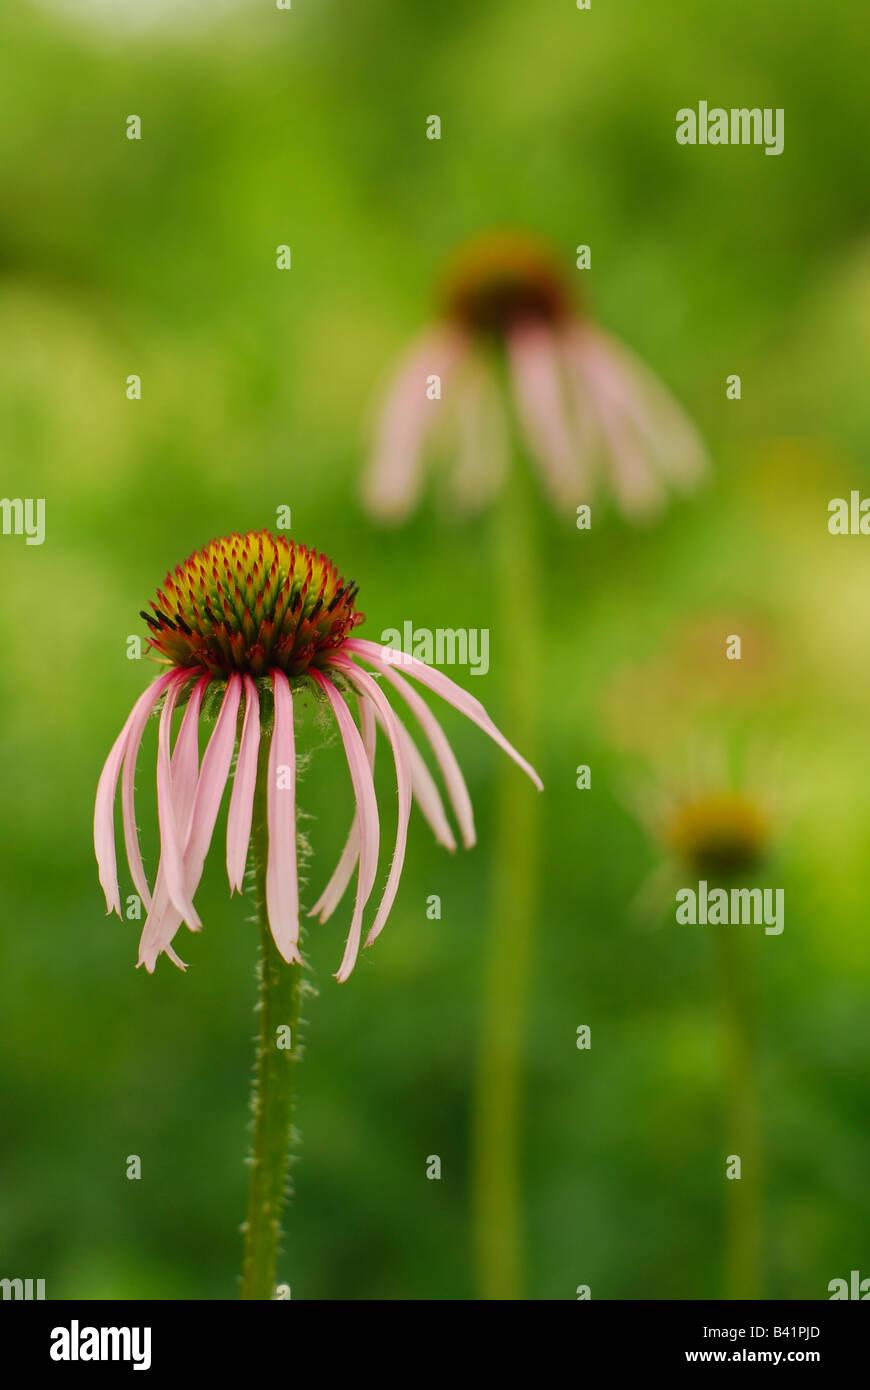 Pourpre clair Coneflowers dans une prairie Garden Photo Stock